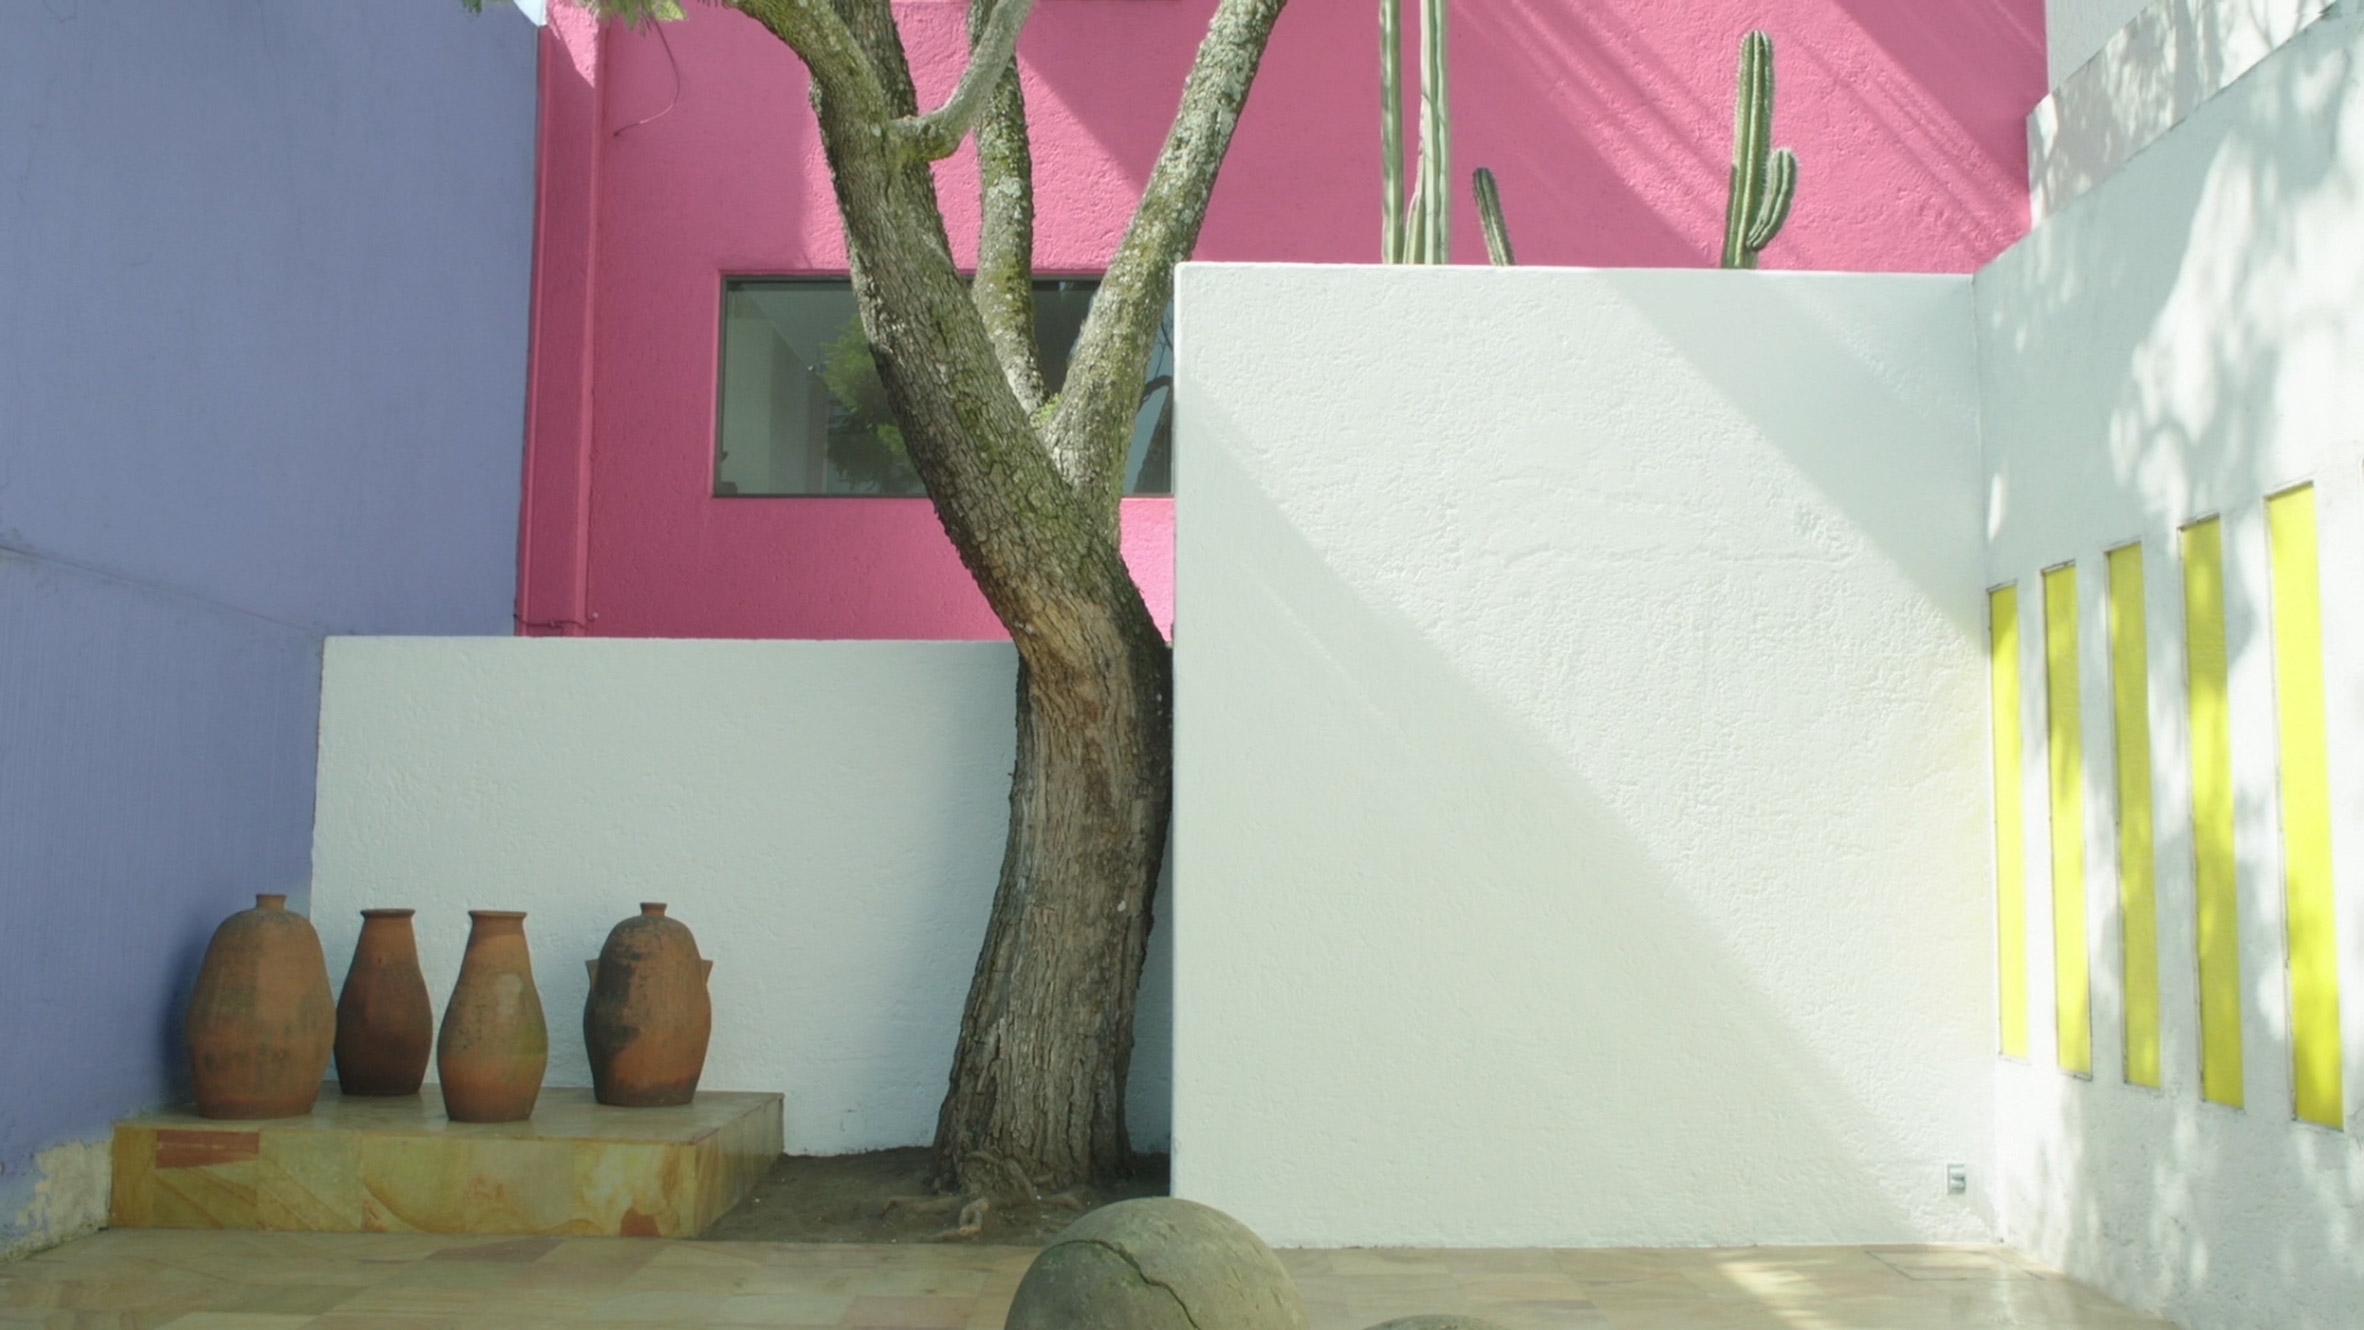 casa-gilardi-luis-barragan-architecture-mexico-usa_dezeen_2364_col_0